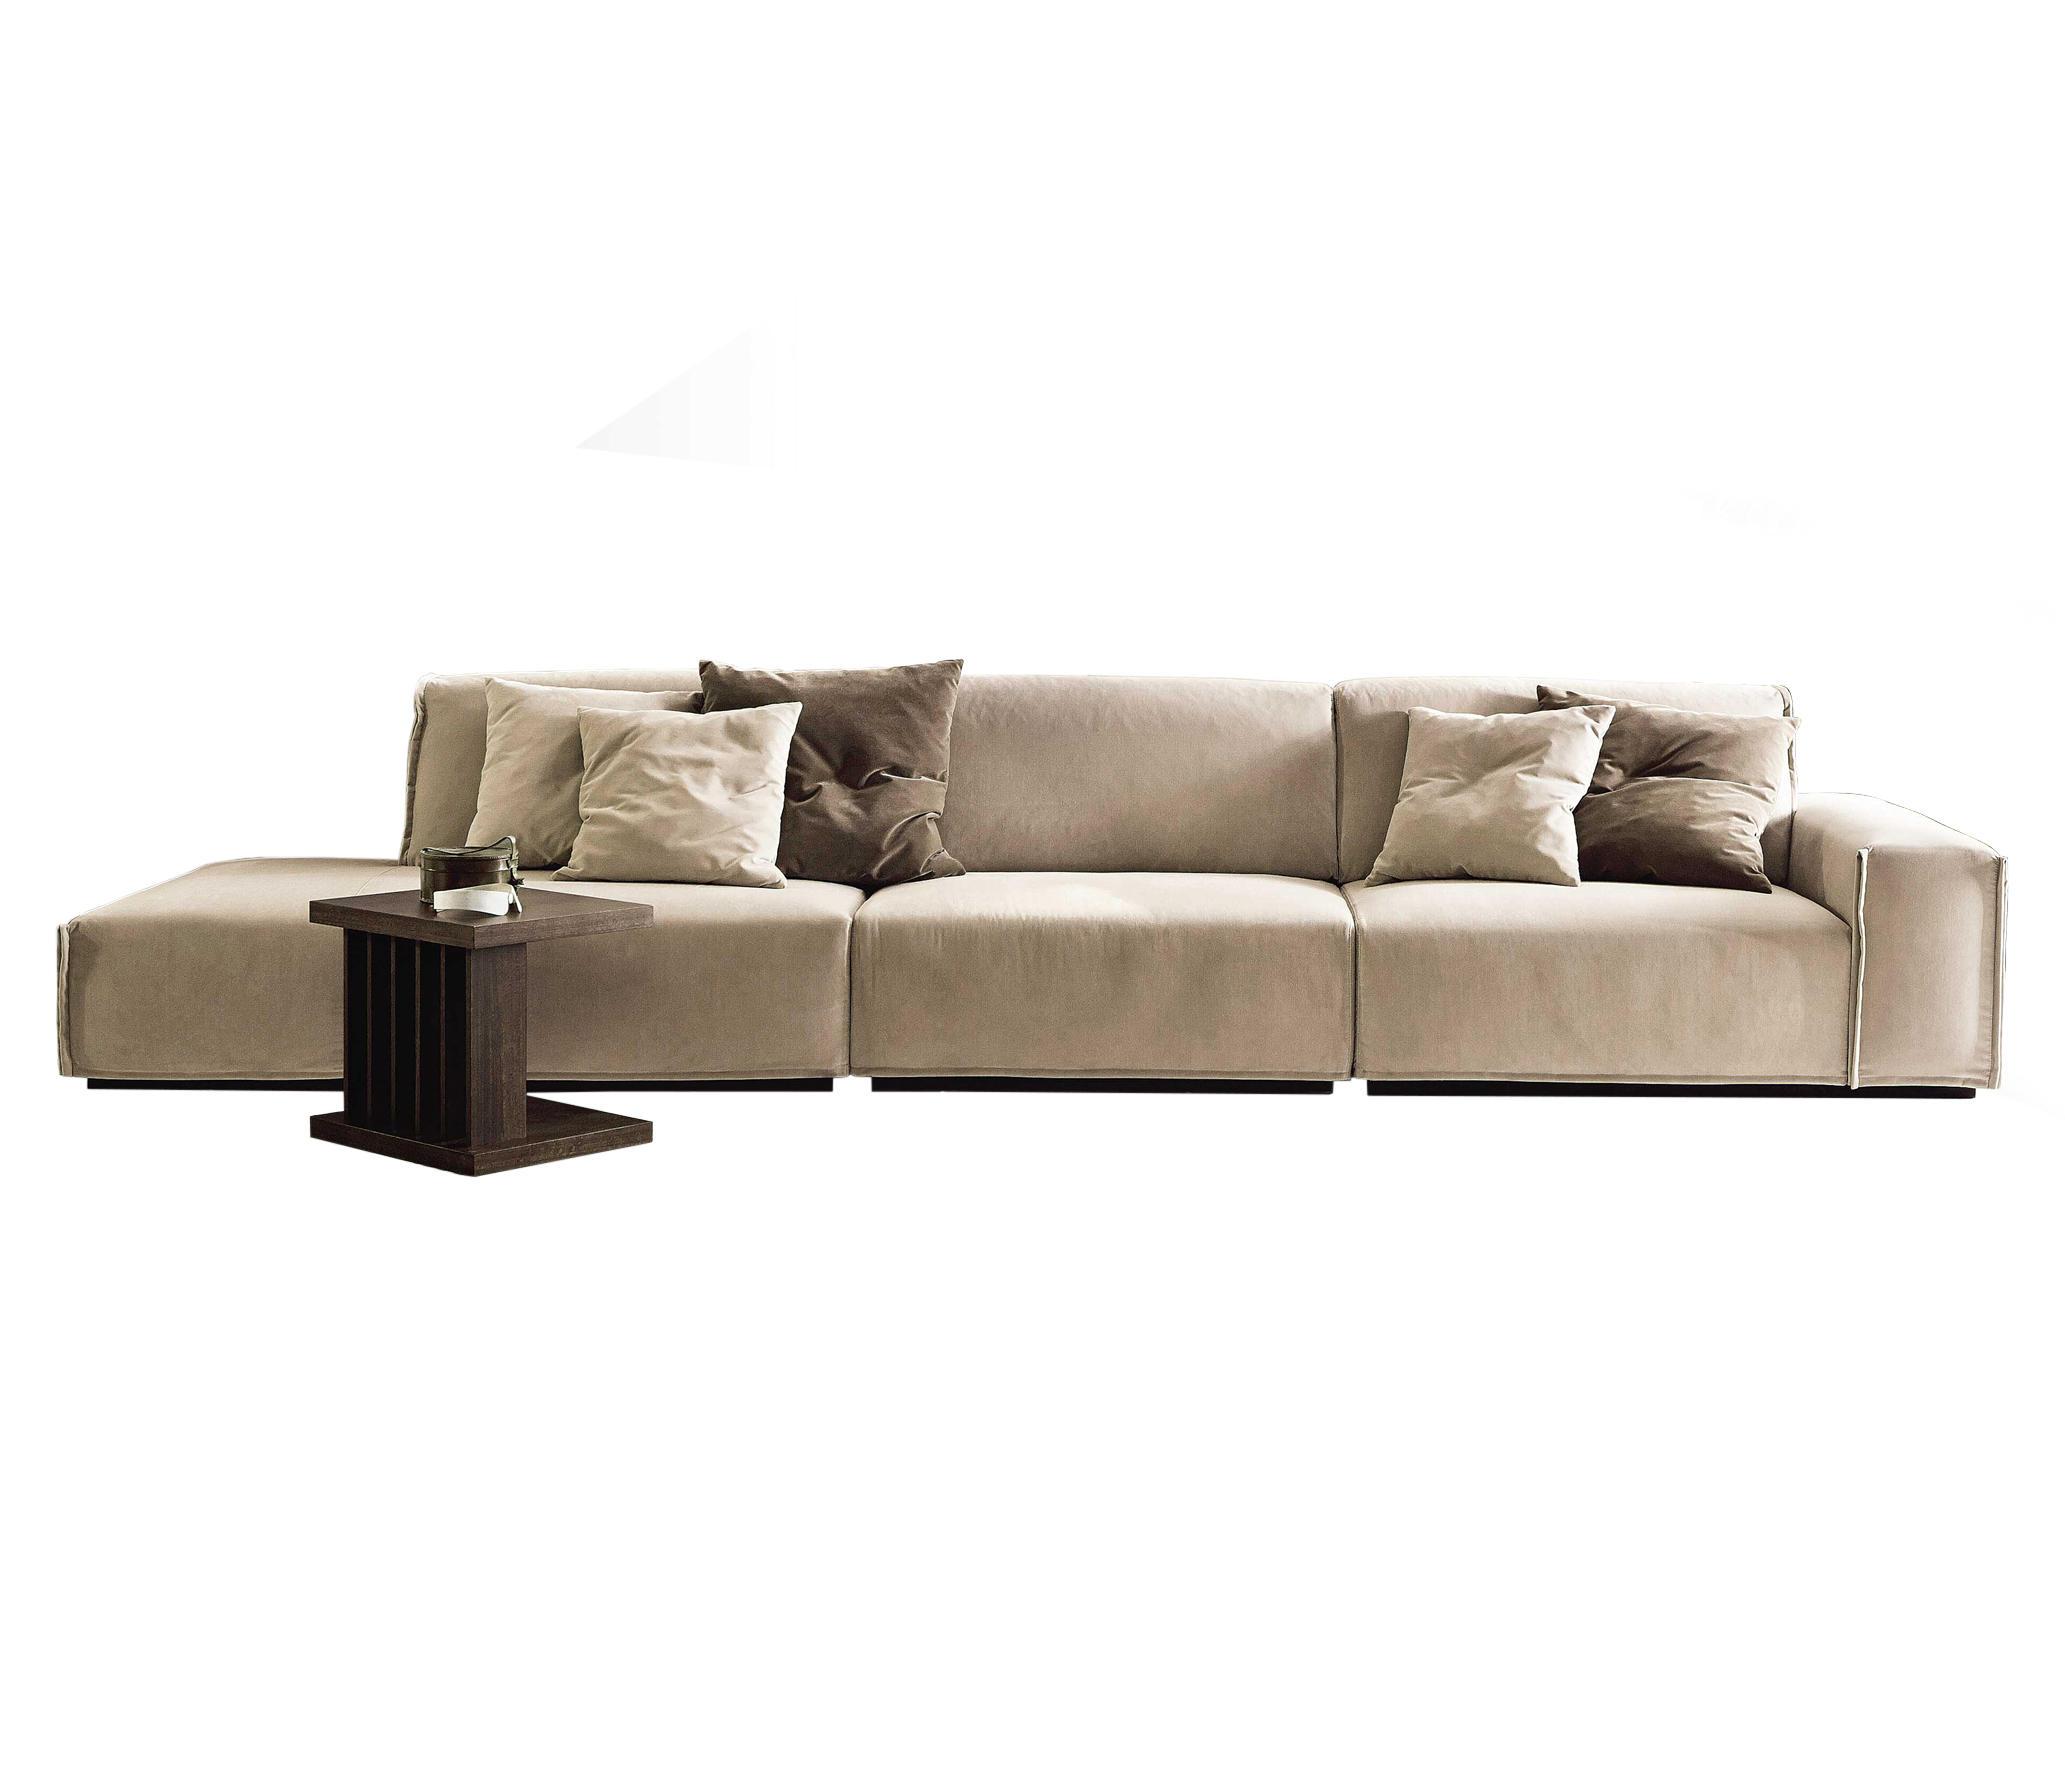 monolith sofas from ditre italia architonic monolith sofas from ditre italia